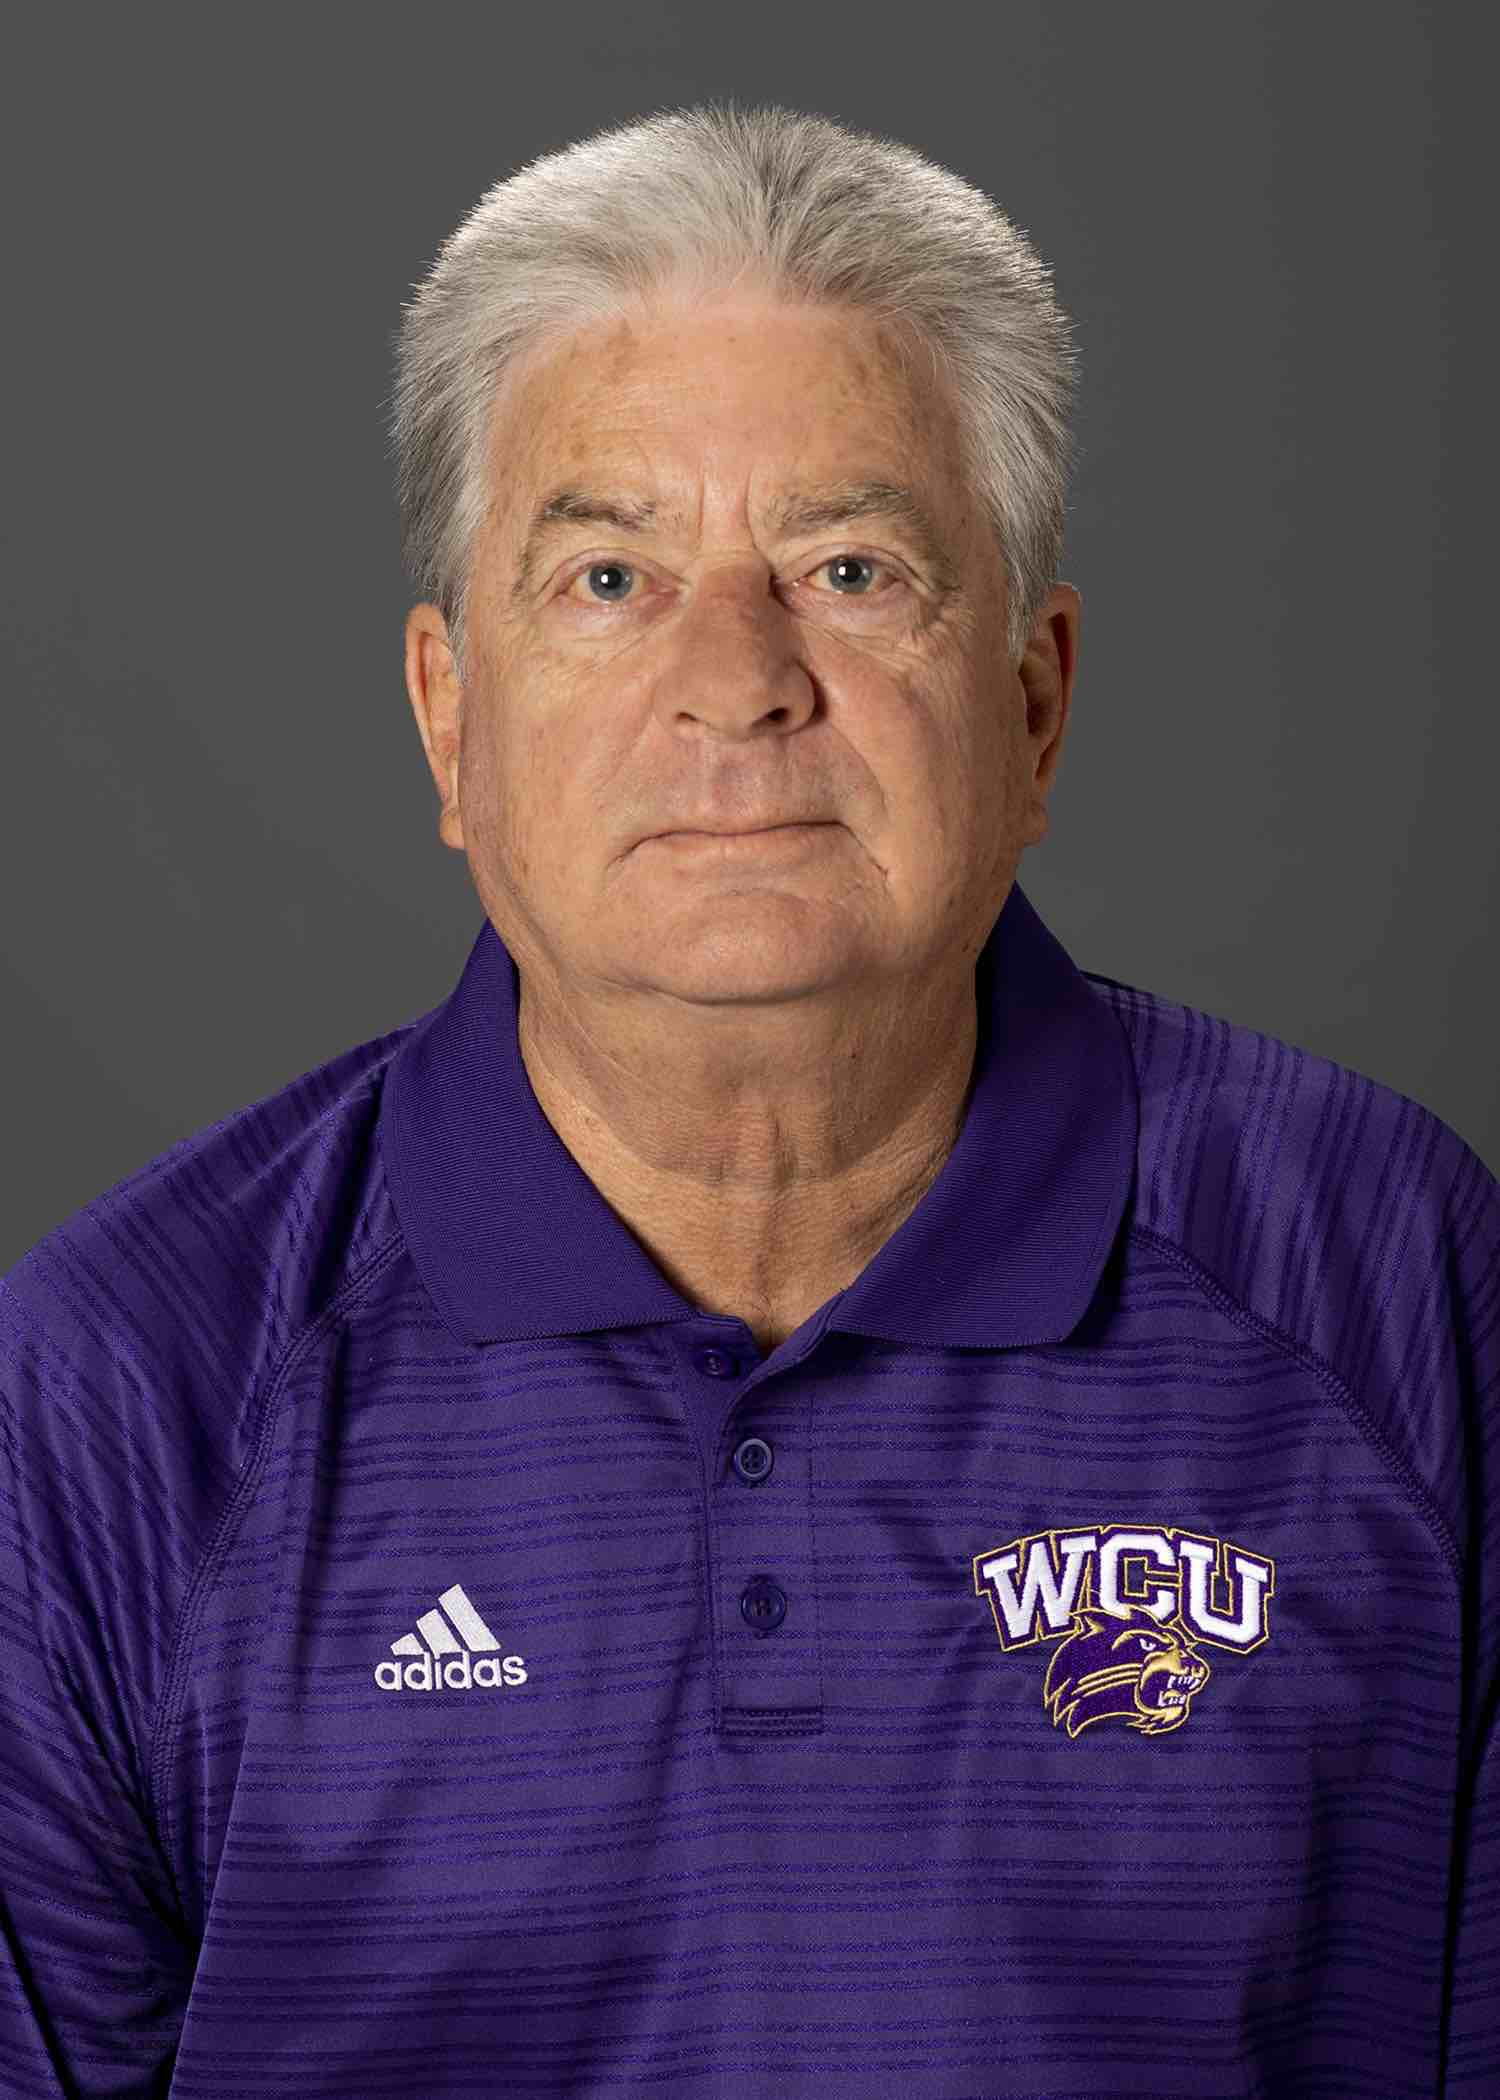 Portrait of Jeff Bewsey